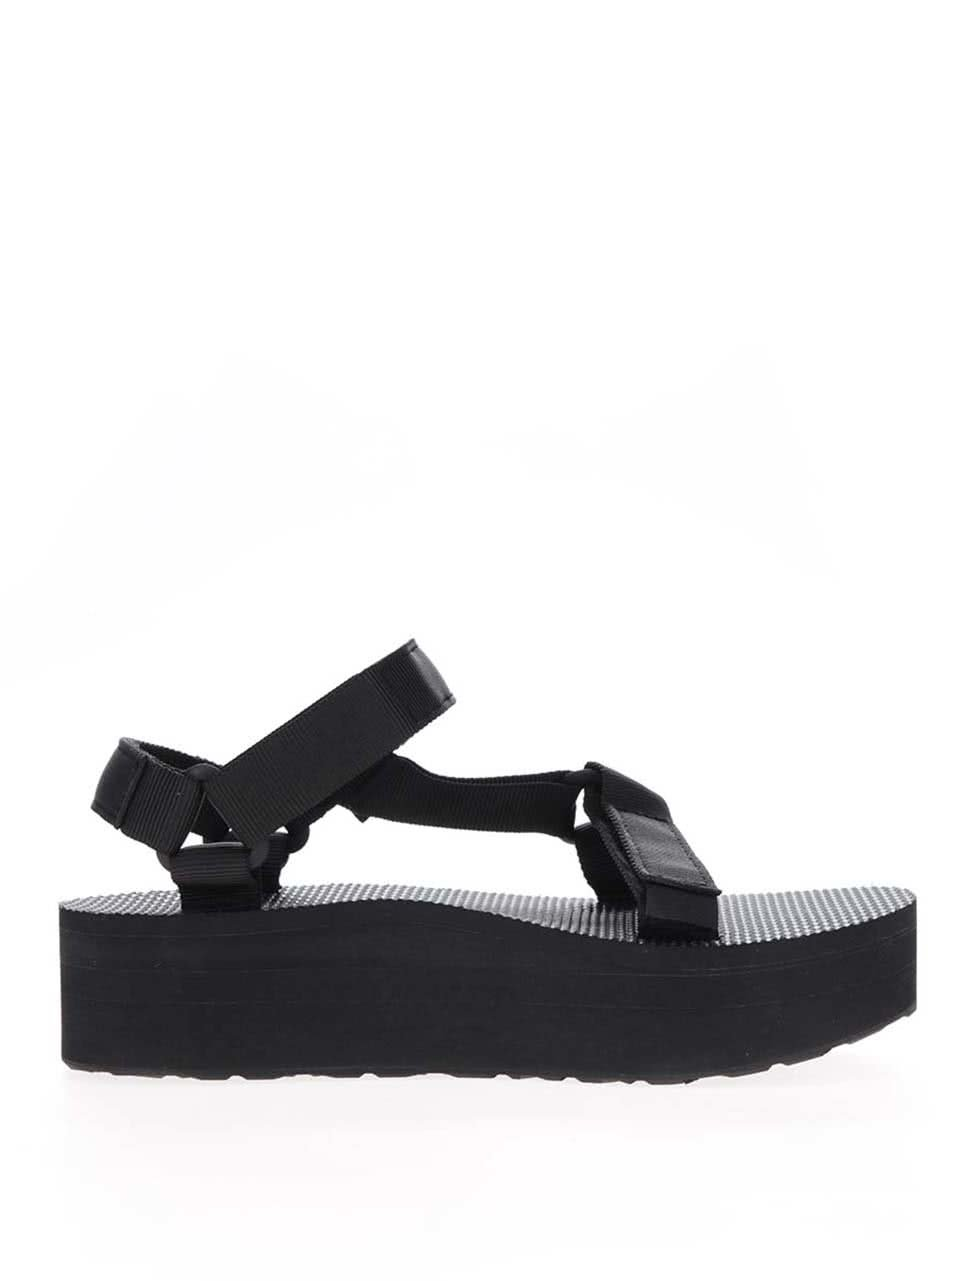 6720b972ee19 Čierne dámske sandále na platforme Teva ...